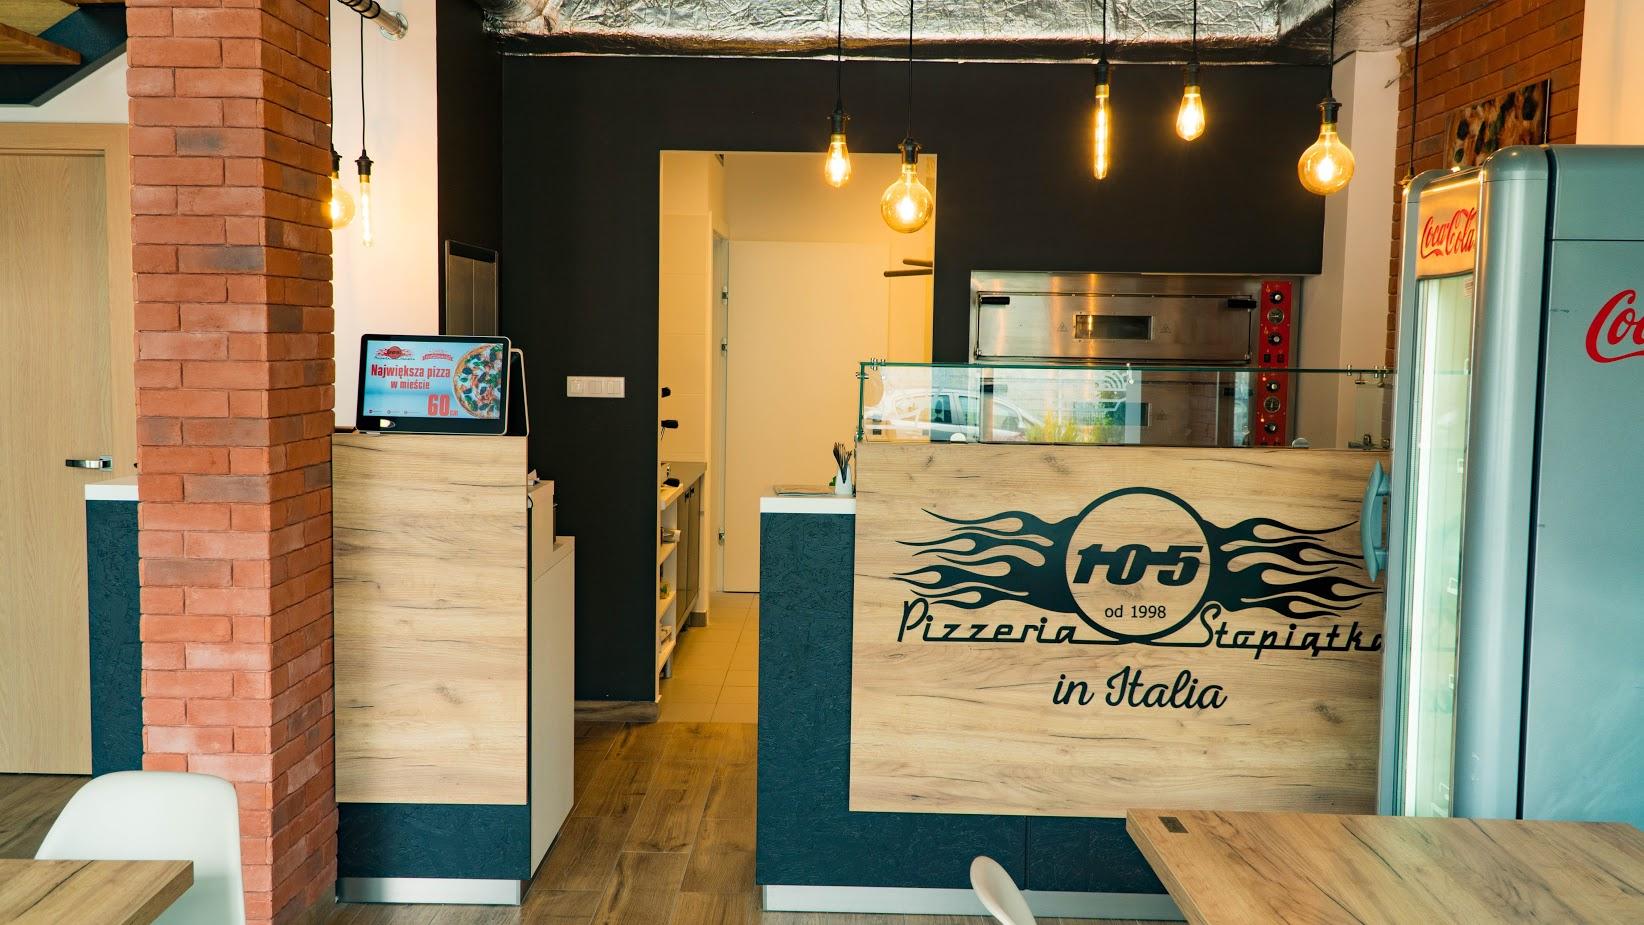 Pizzeria 105 (Obywatelska 28)